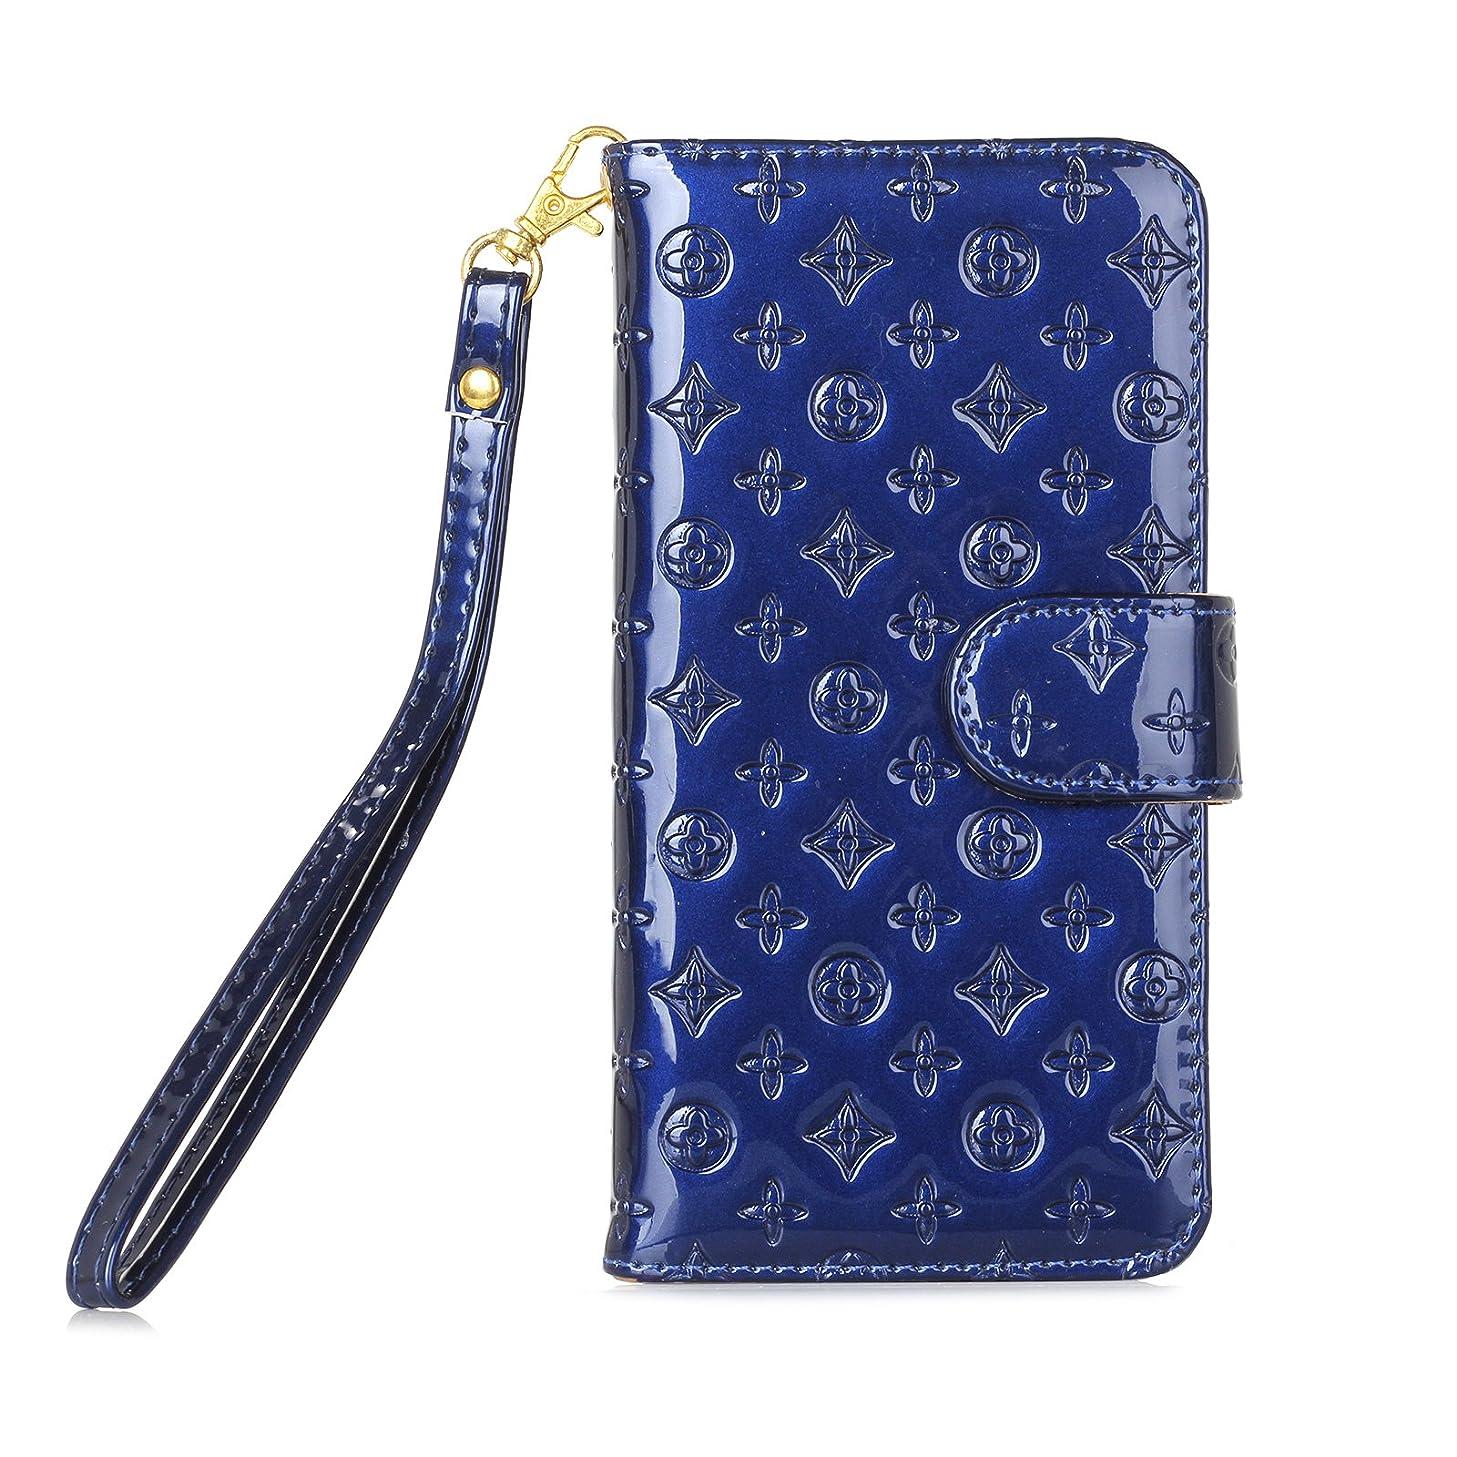 【Marxilous】iphone 7/ iphone 8 対応 花柄 ケース 純色 手帳型 横開き レザー 革 カバー マグネット式 カードポケット スタンド機能 アイフォン7 8 用 財布型 カバー ストラップ付き (iphone 7/ iphone 8, ブルー)